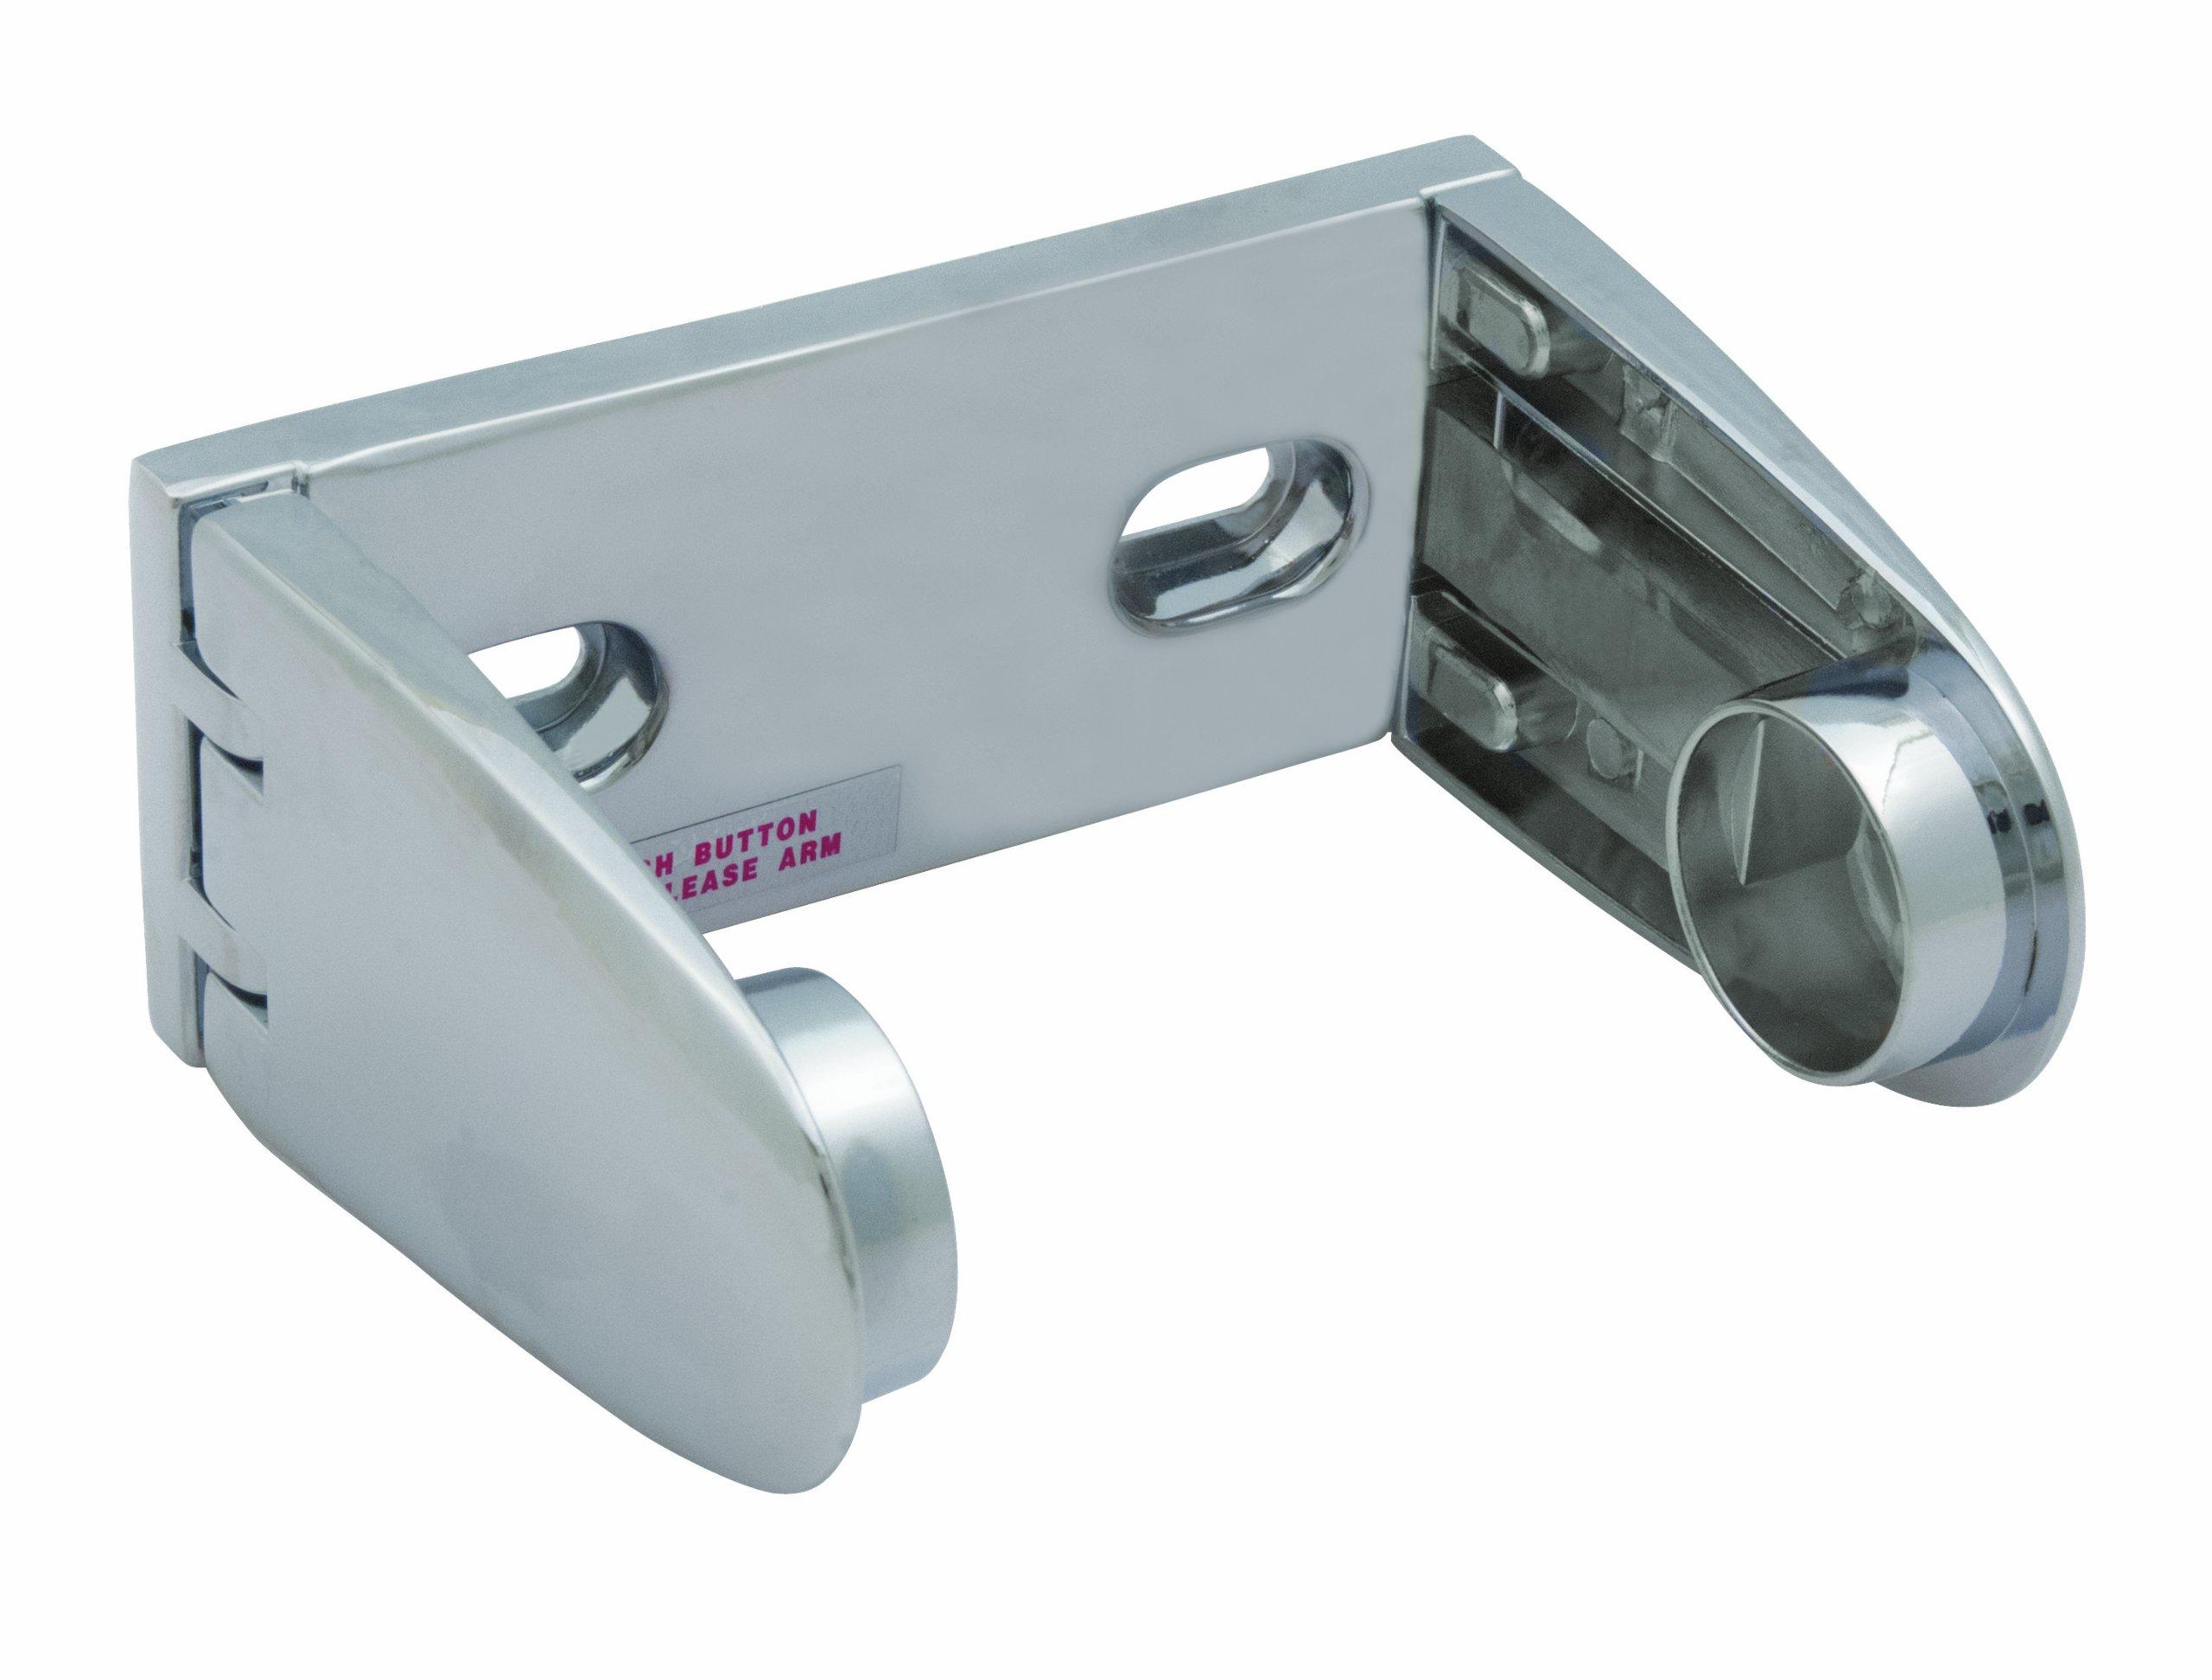 Bradley 505-000000 Die Cast Zinc Tension Spring Control Spindle Less Toilet Tissue Dispenser, 5-1/2'' Width x 2-3/8'' Height x 4-1/4'' Depth